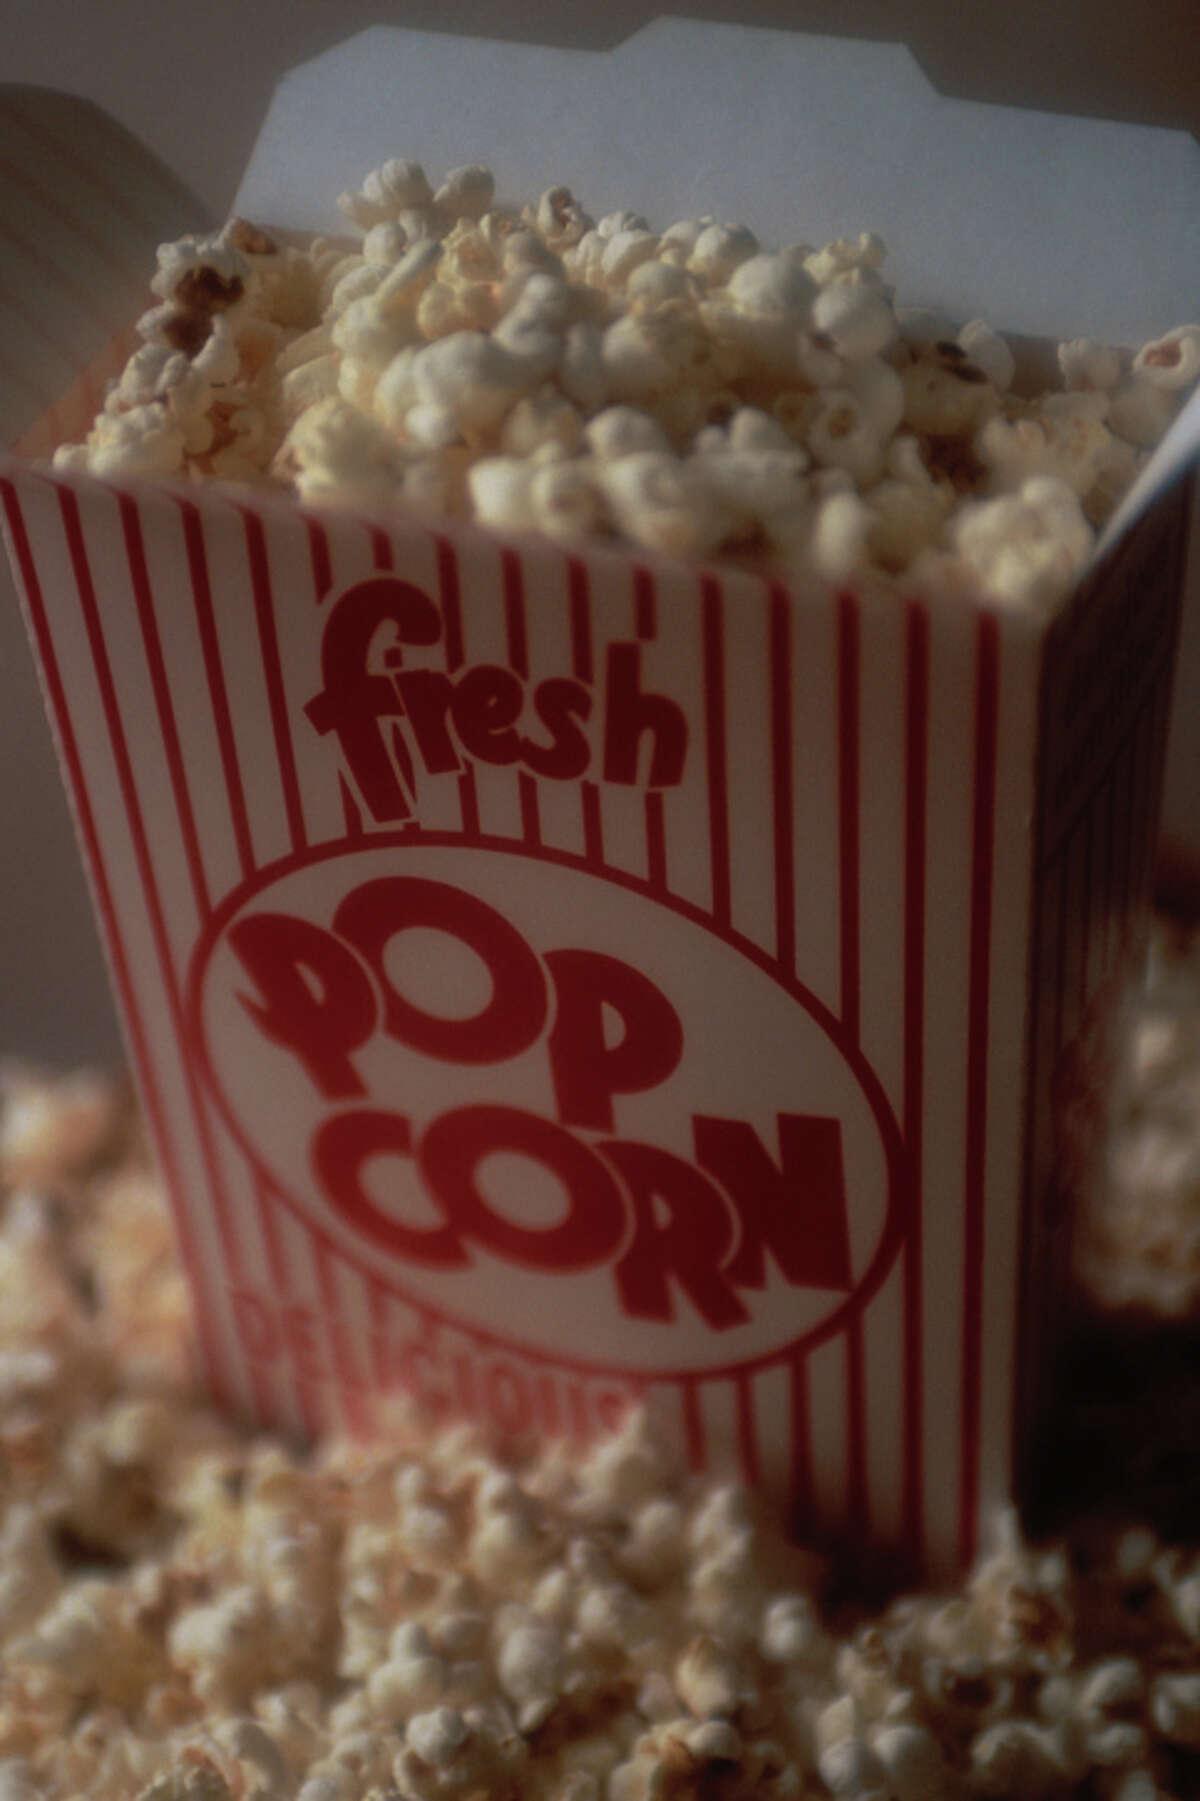 Illinois state snack: Popcorn